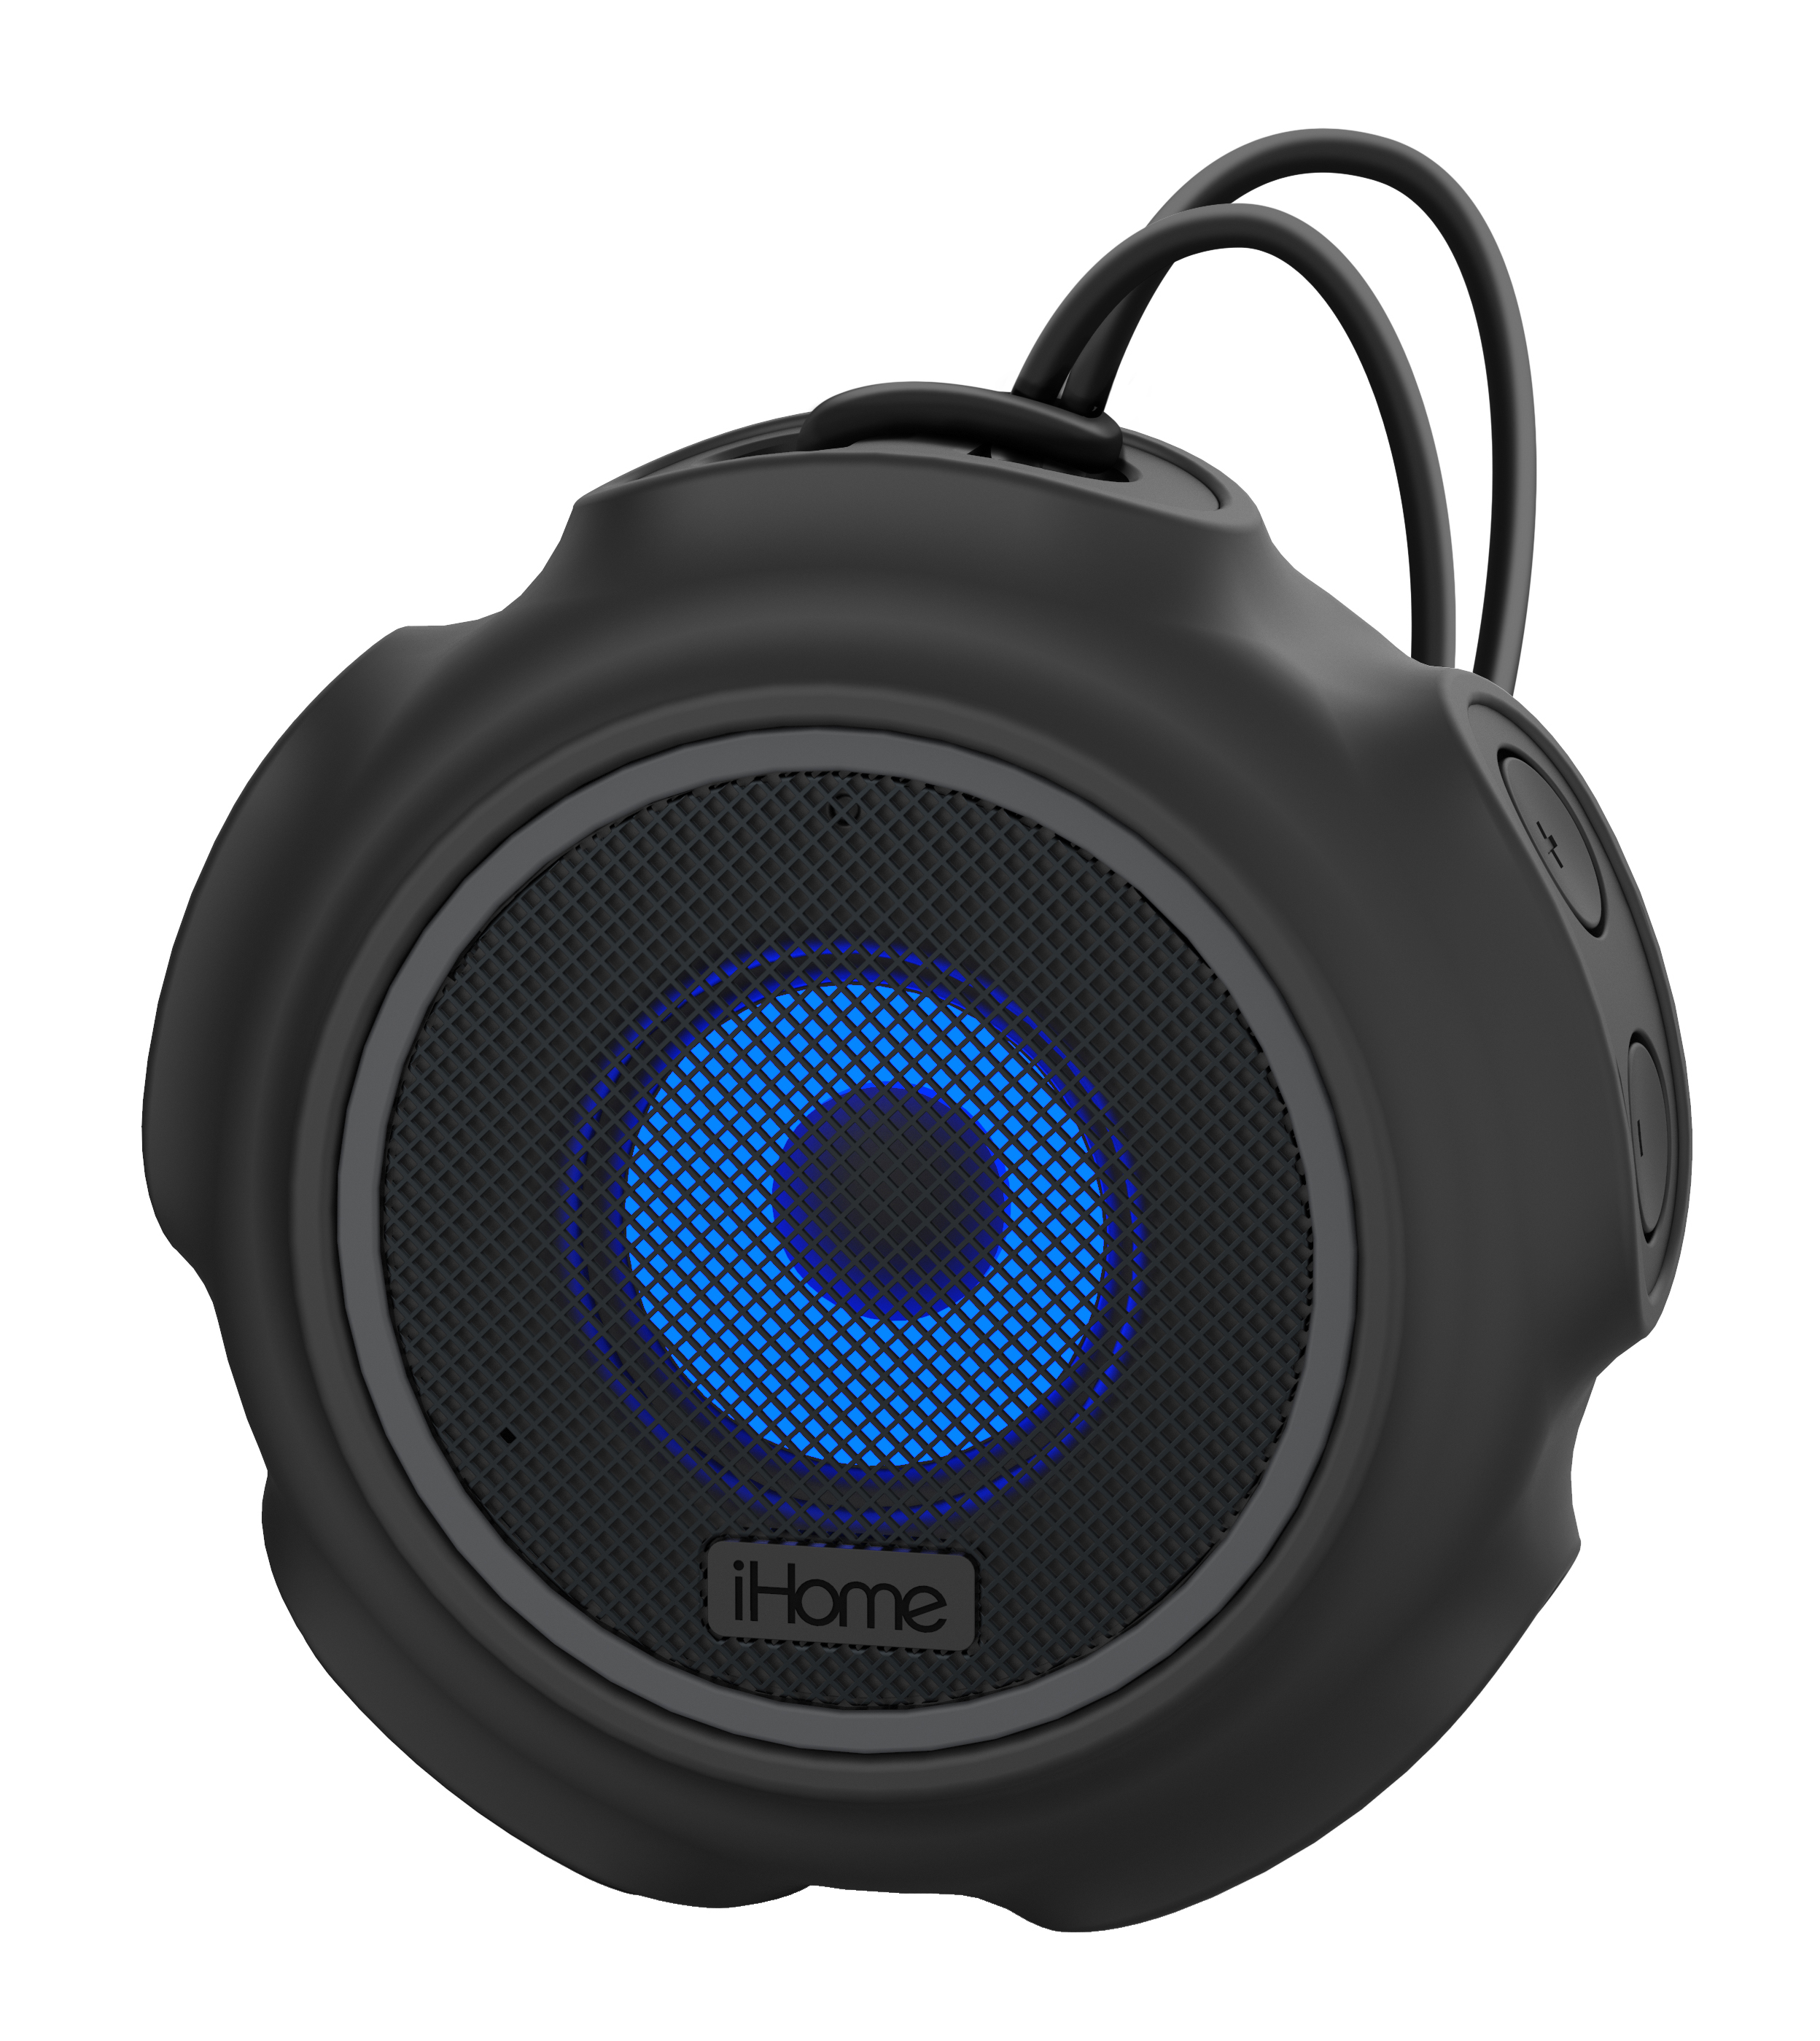 iHome iBT822 Portable Waterproof Color Changing Bluetooth Speaker